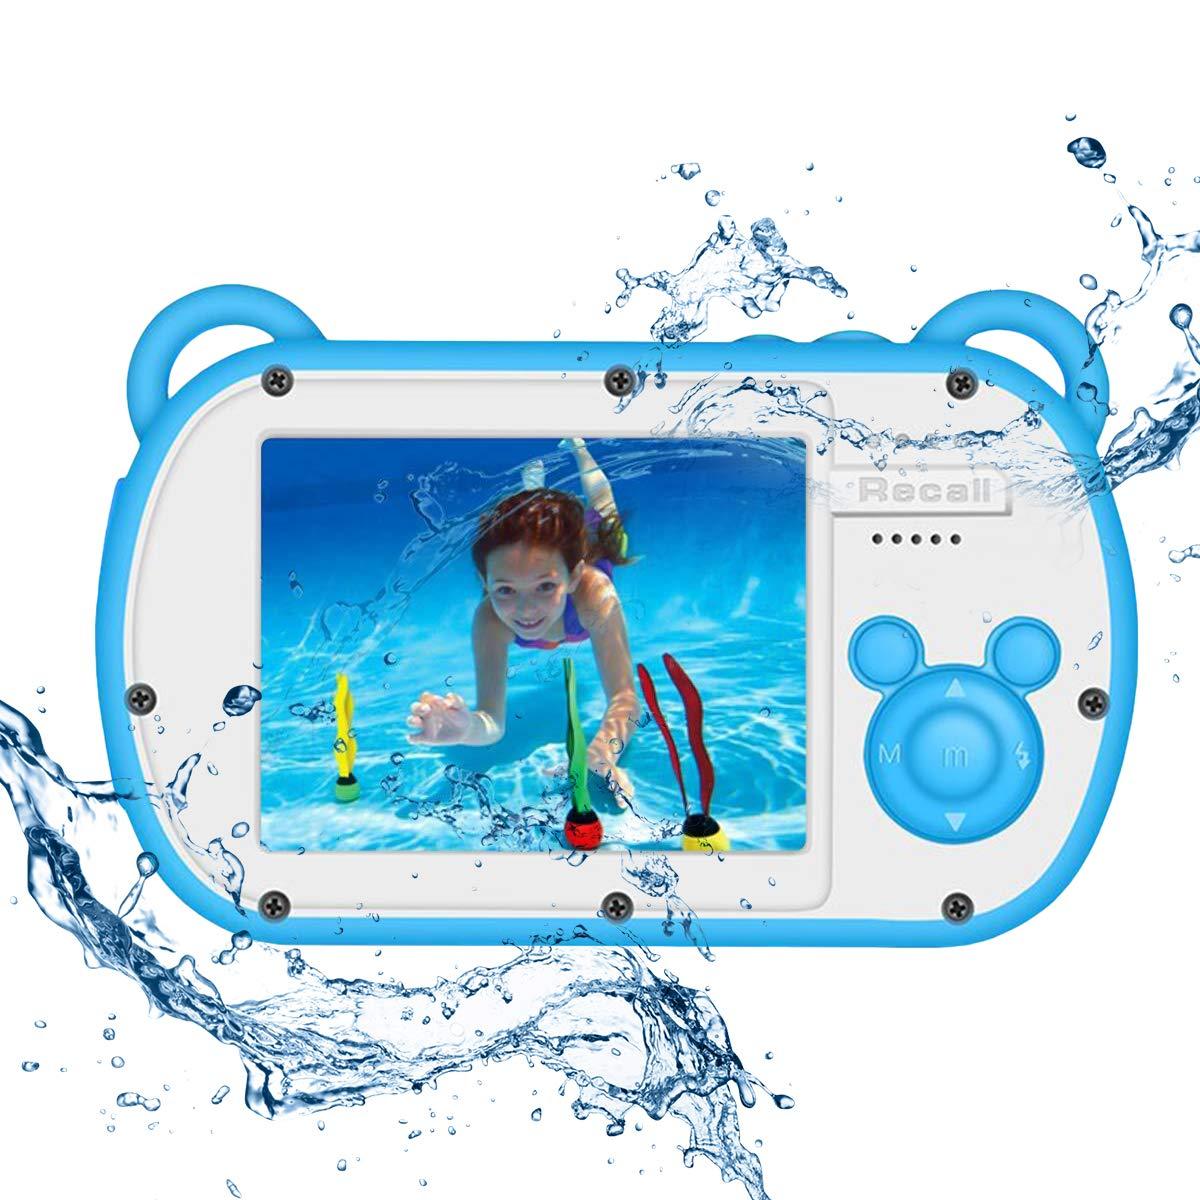 CamKing Kids Digital Camera, K3 2.7'' Screen Children's Cartoon Digital Camera, Blue